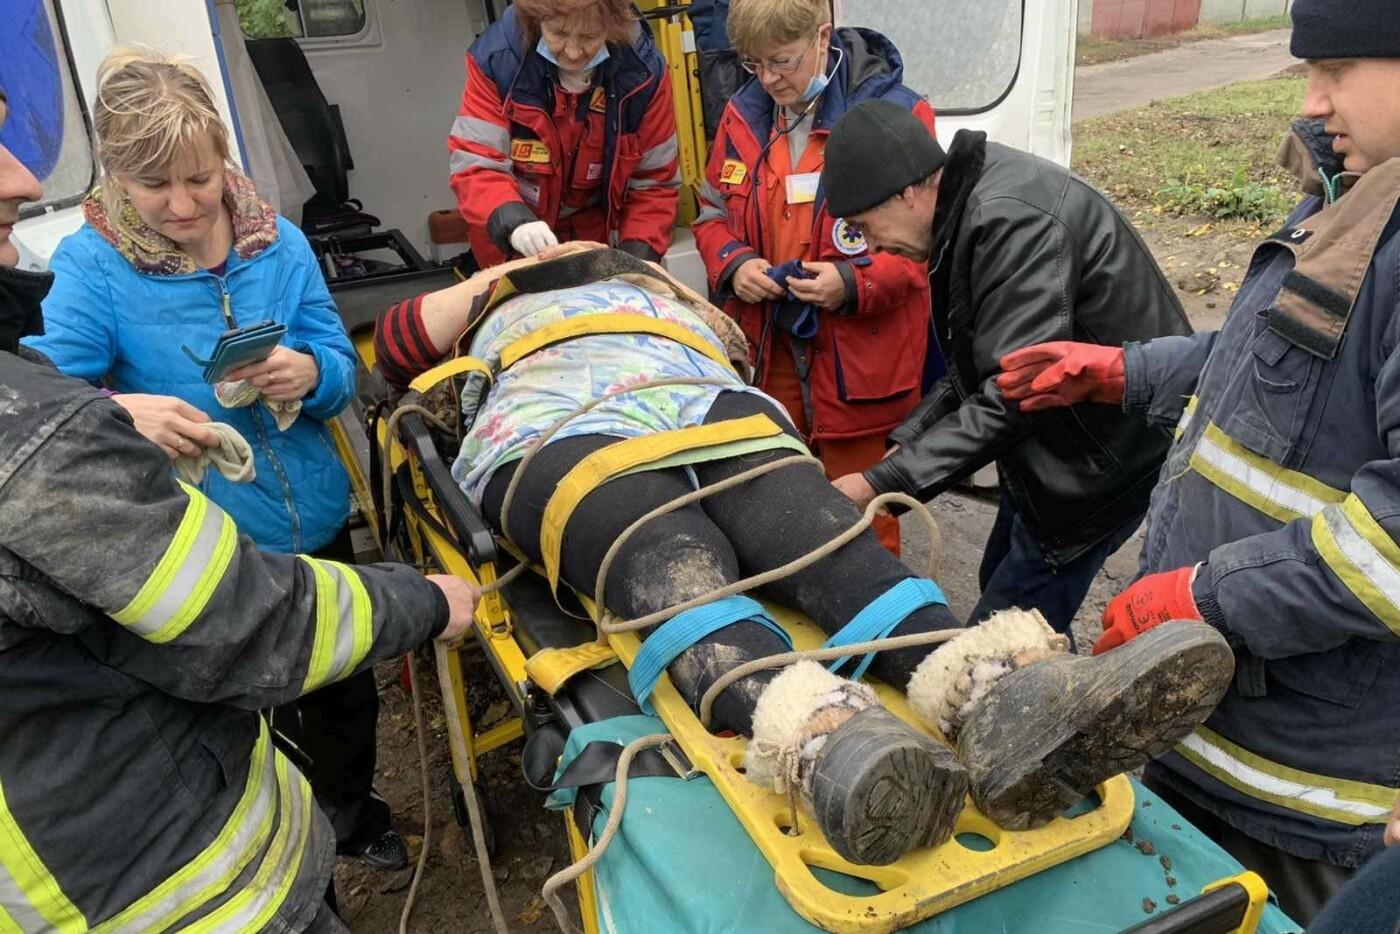 Ноги зажало обломками плиты: в Харькове пенсионерка упала в бетонную яму, - ФОТО, фото-1